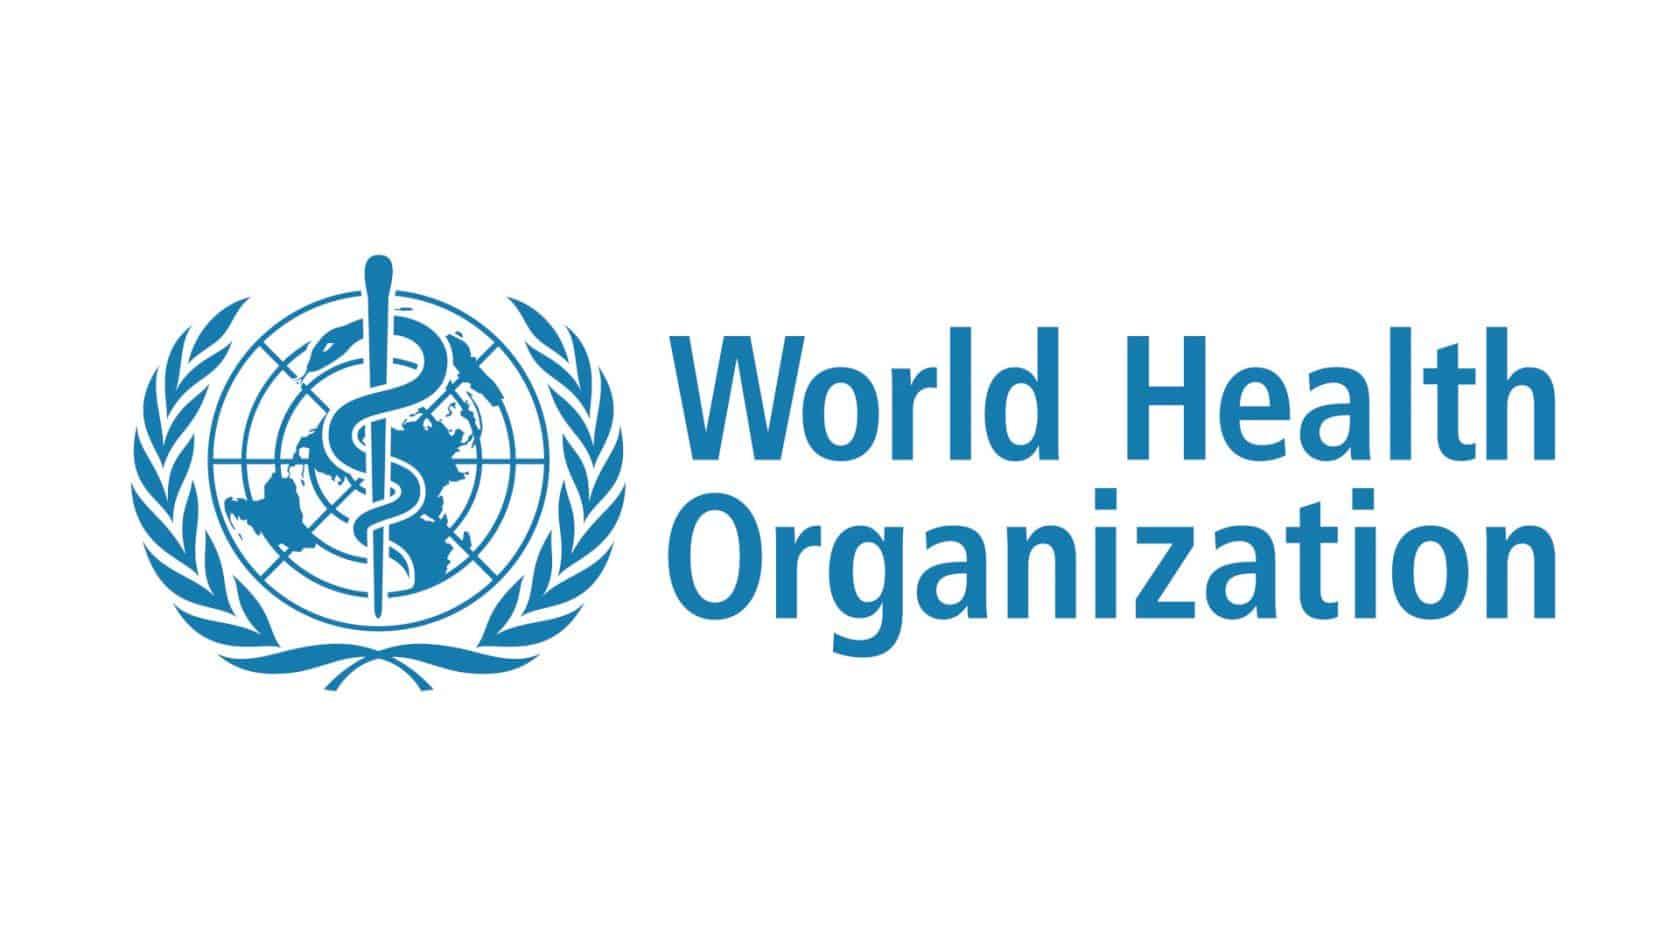 World Health Organization logo on white background